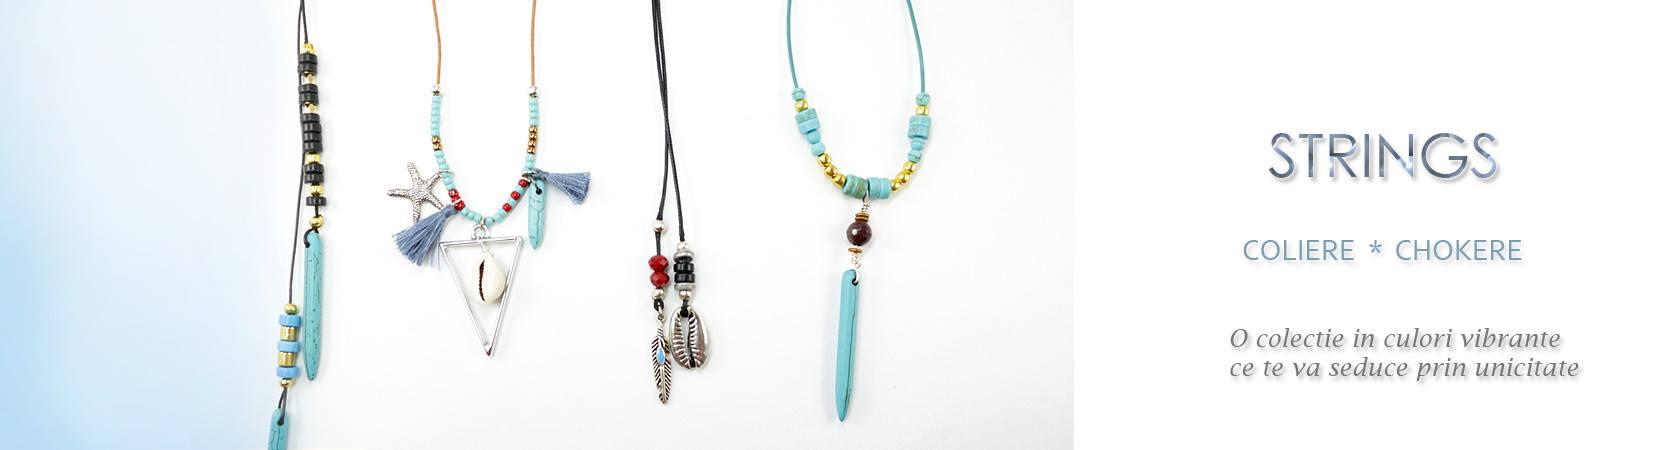 Coliere handmade chokere pentru femeile cu gusturi sofisticate